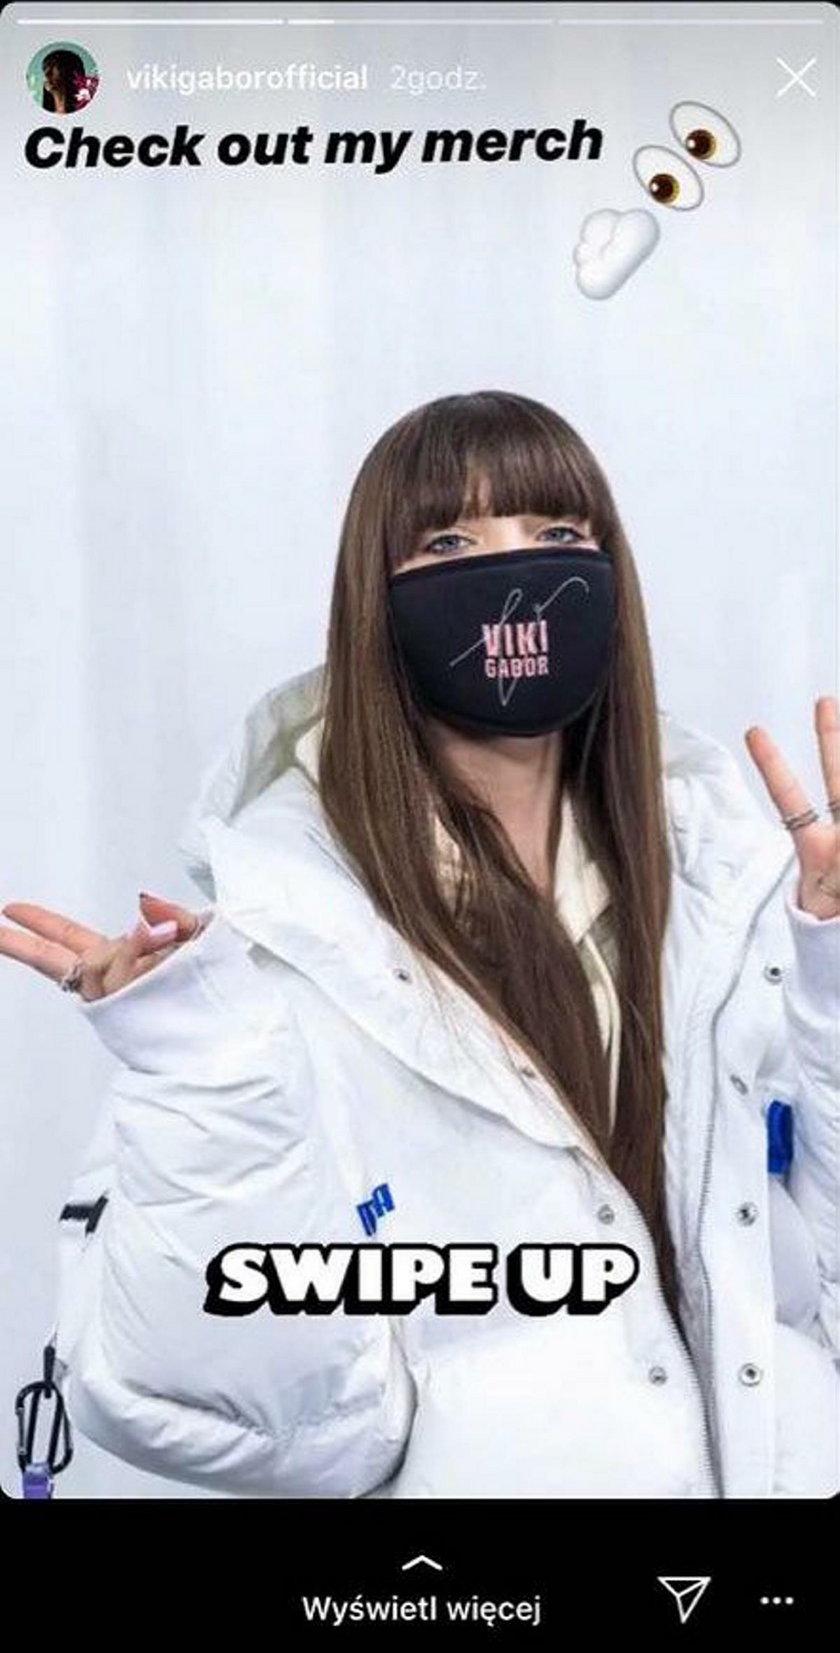 Viki Gabor w maseczce ze swoim logo